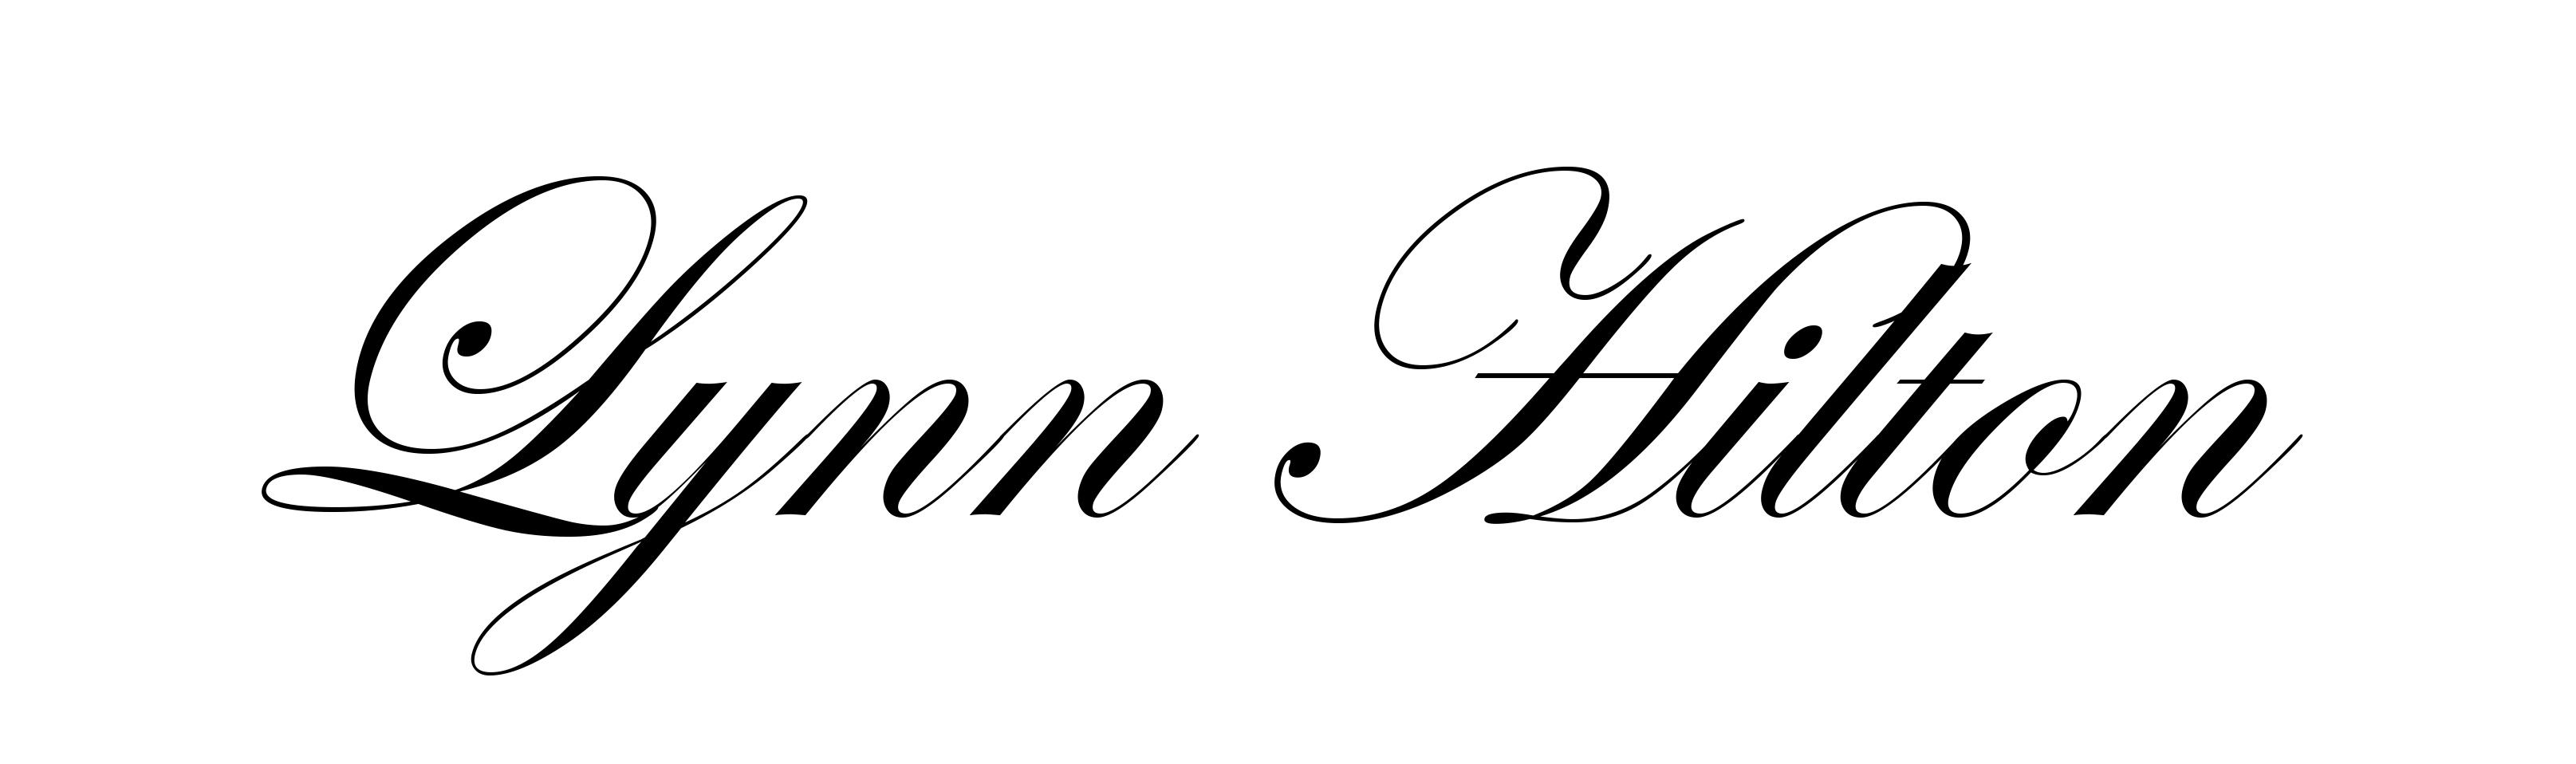 Lynn Hilton's Signature